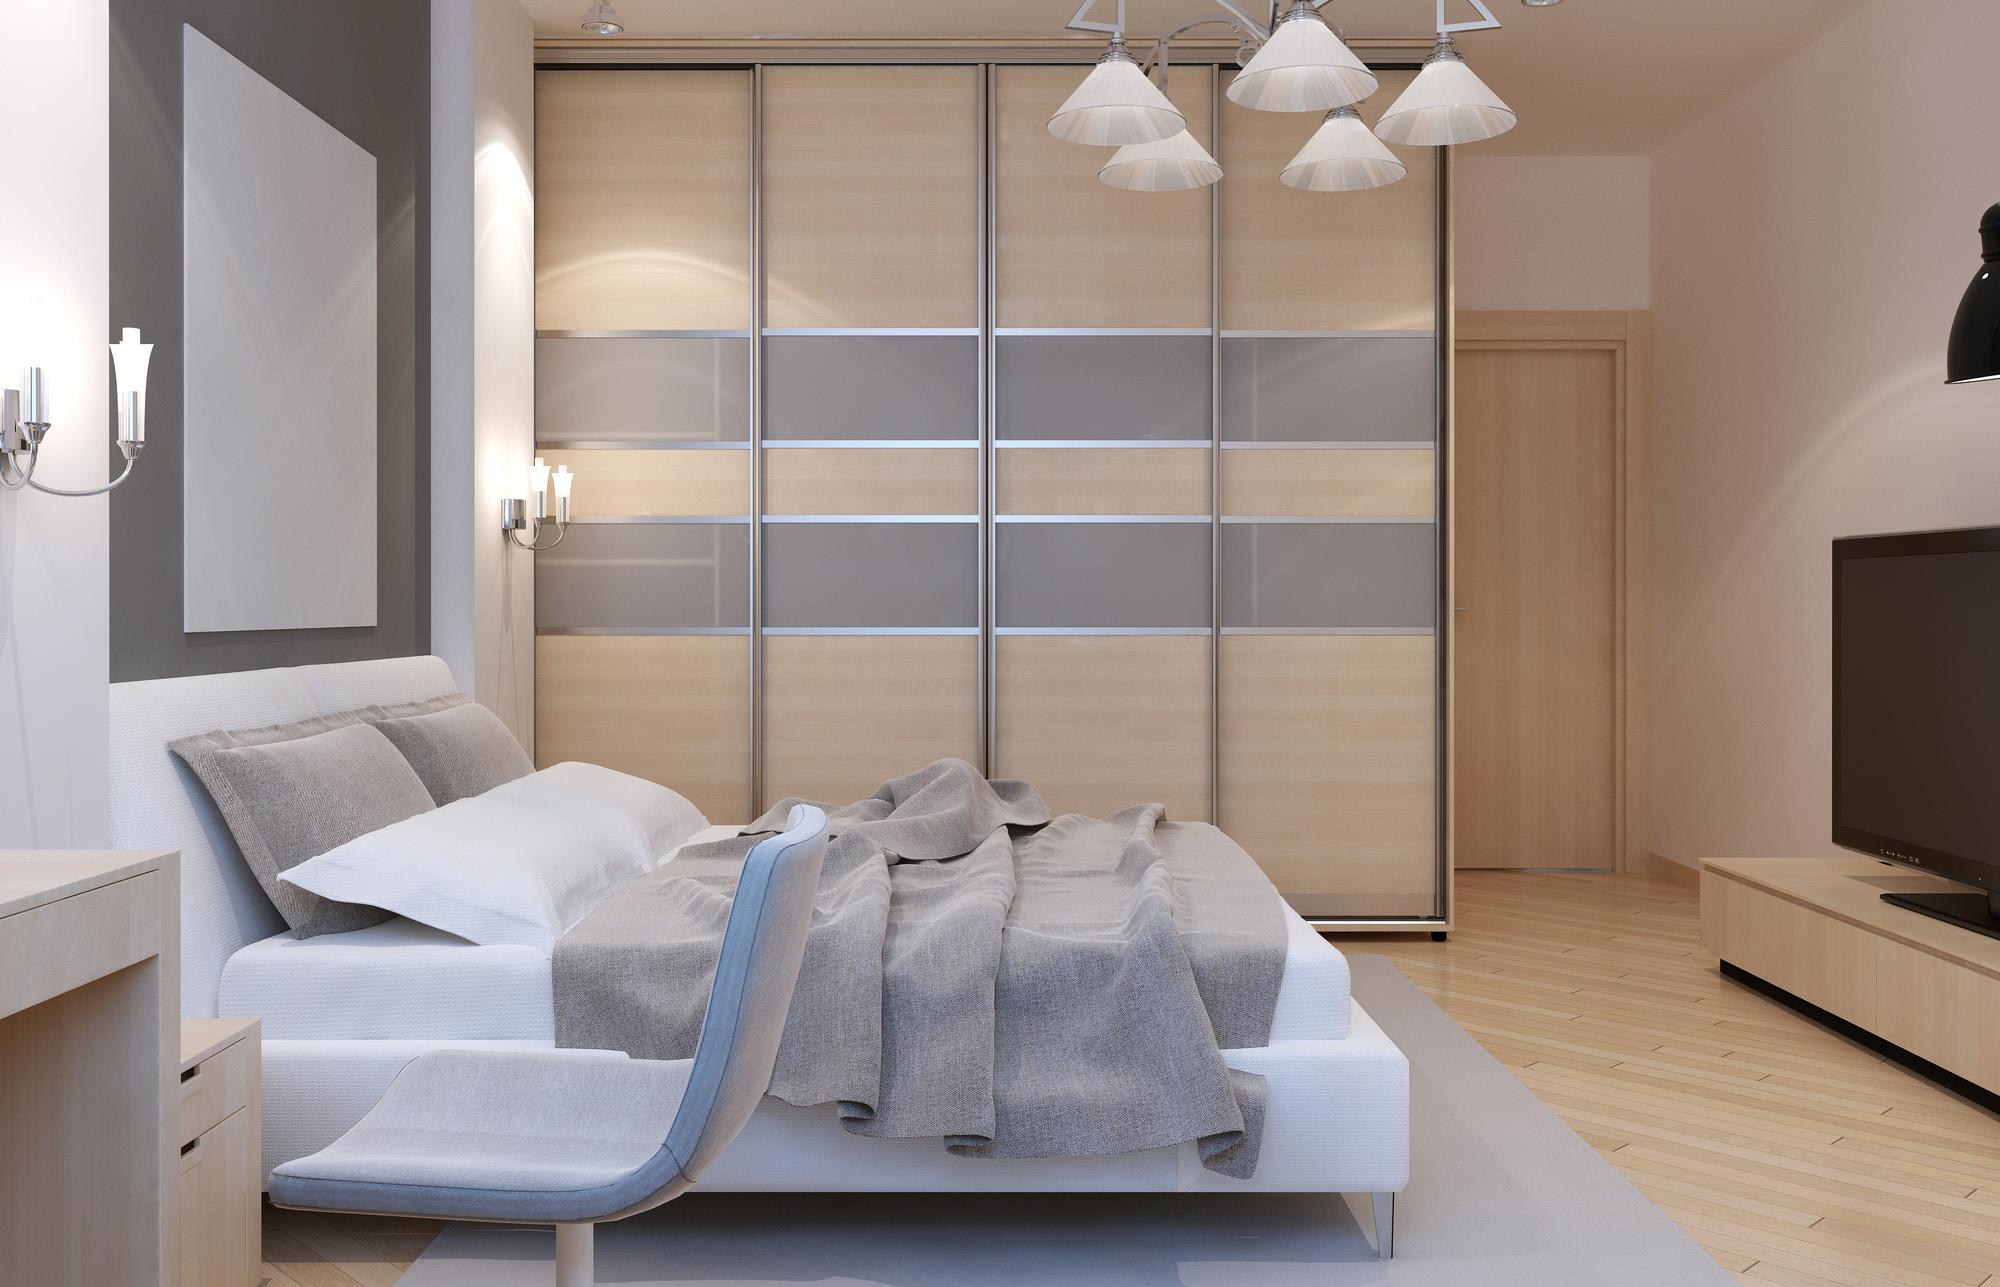 four door wardrobe, grey sliding wardrobe, fitted wardrobes